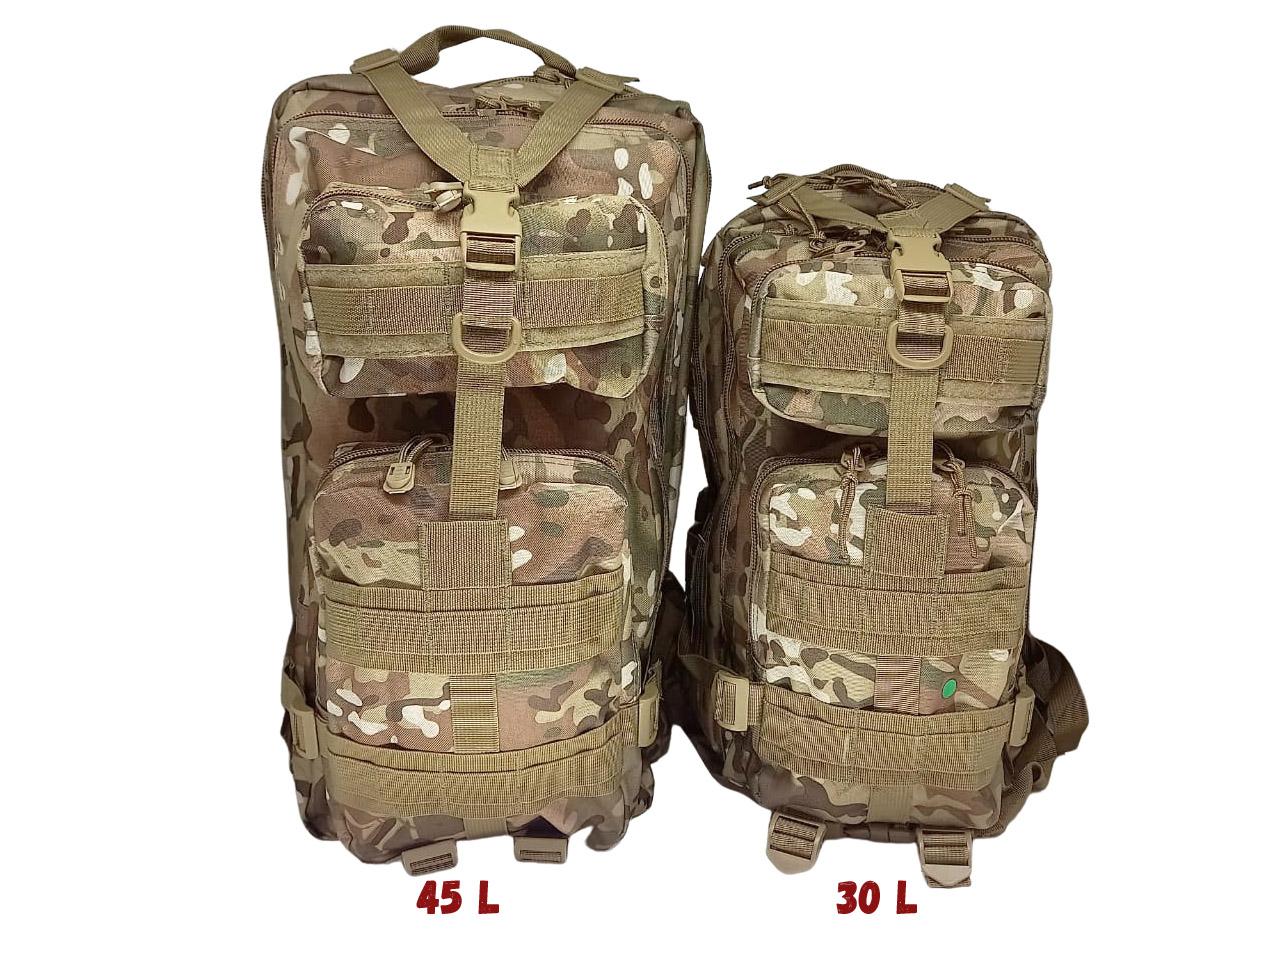 Mochila Tatica Militar Cordura 45 L - Cor: TAN  - MAB AIRSOFT